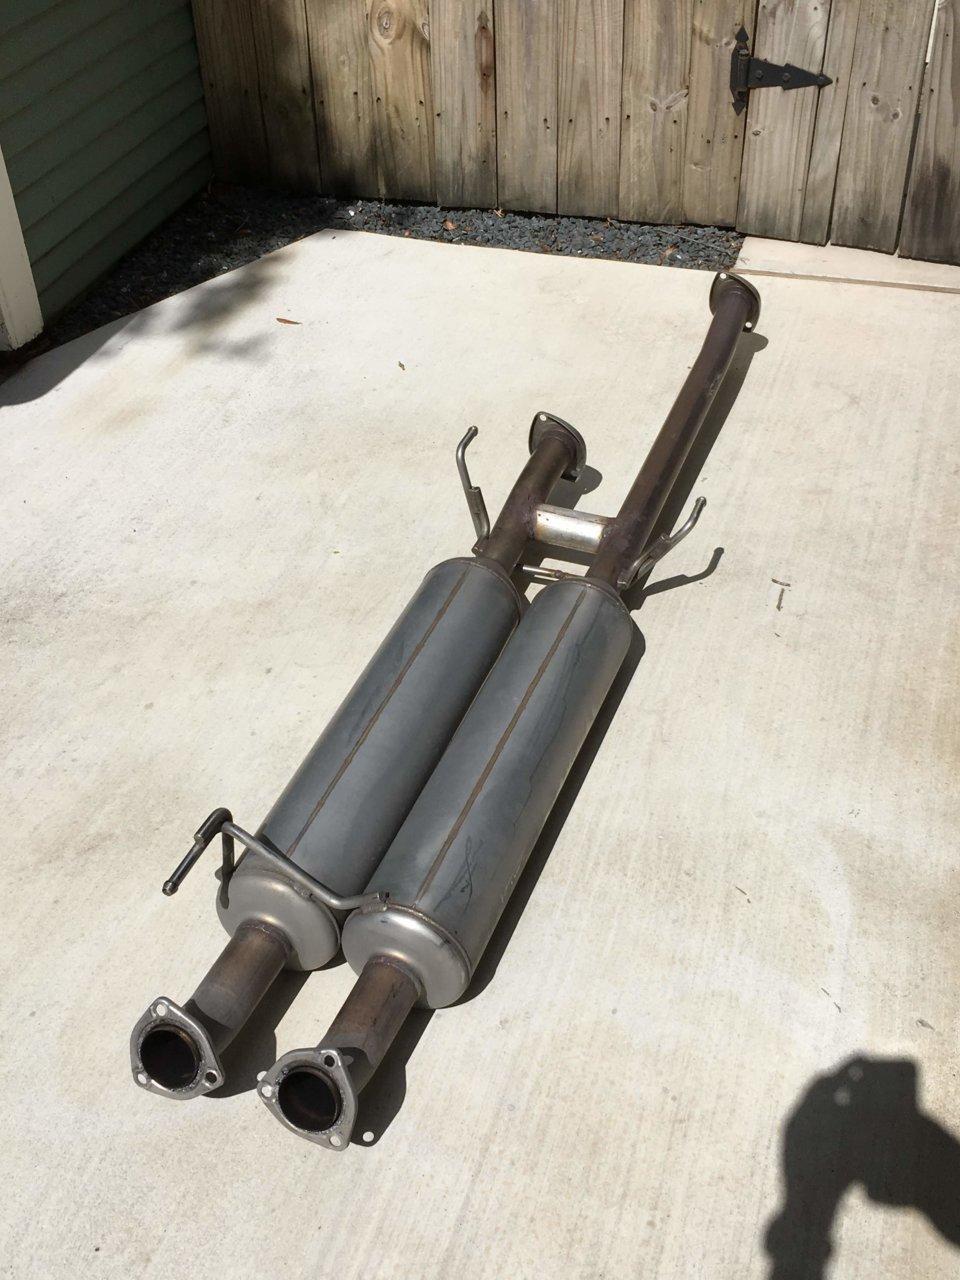 trd dual exhaust muffler section w